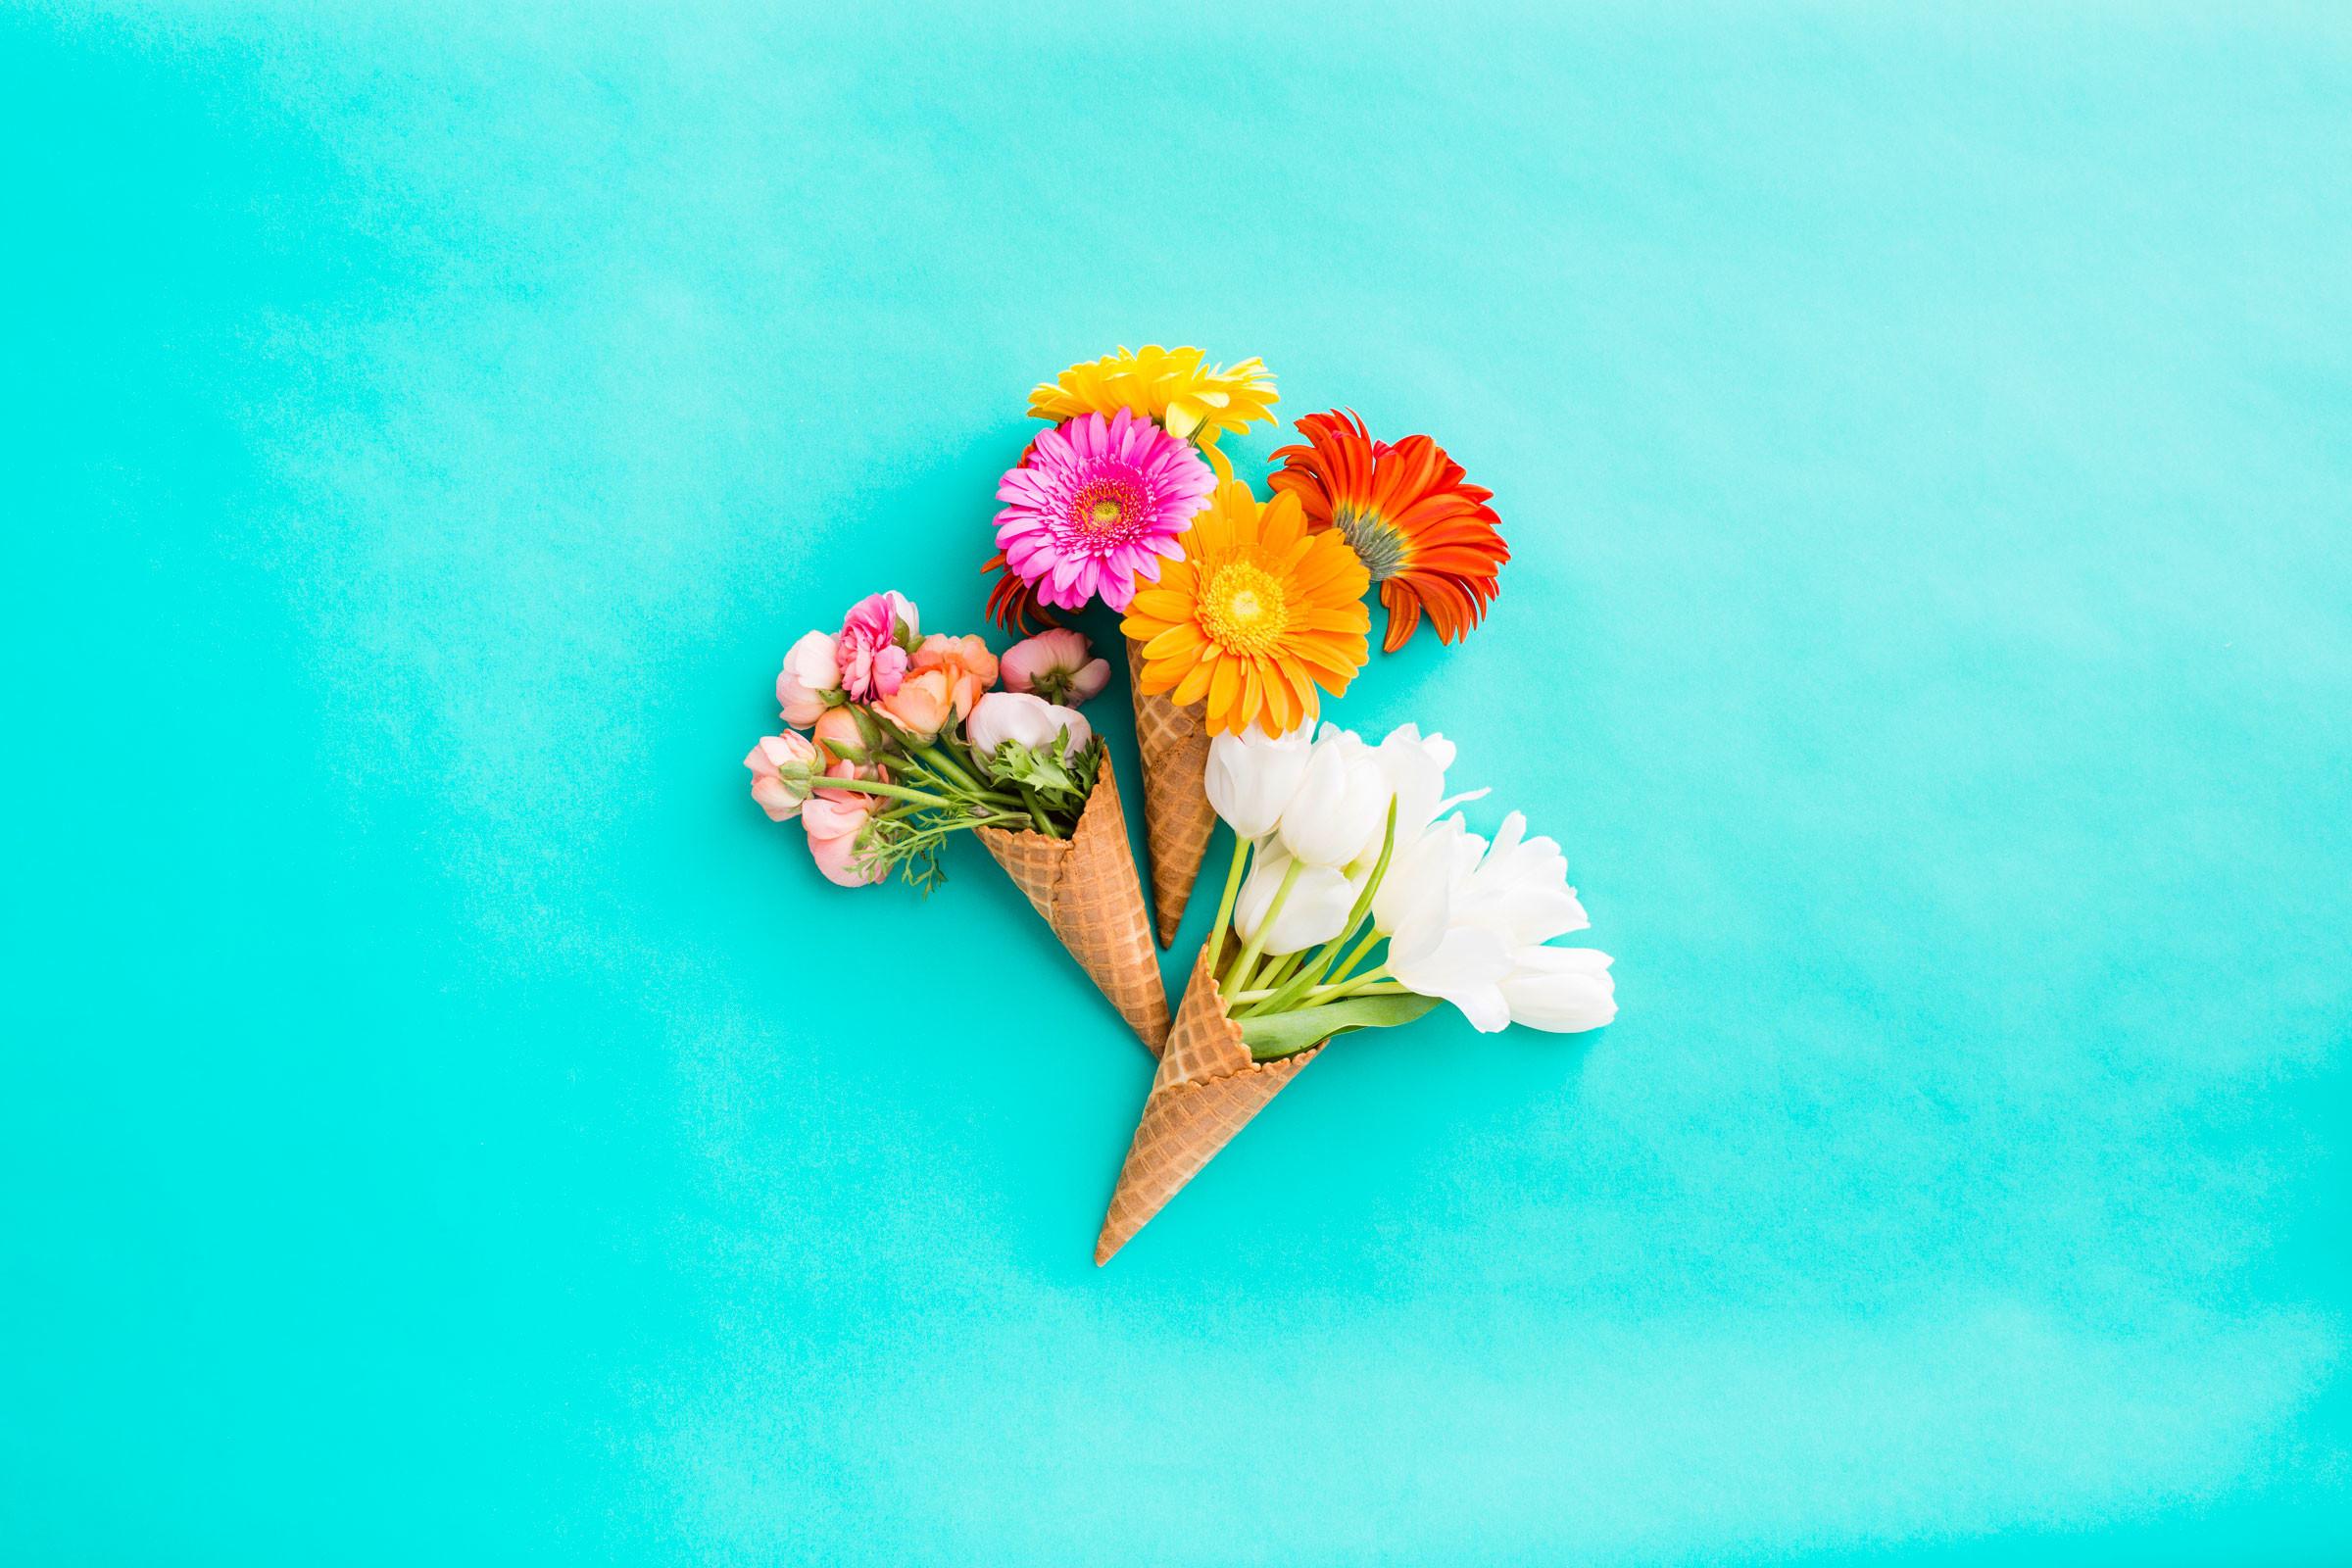 Res: 2400x1600, Download Floral Bunch of Ice Cream Cones